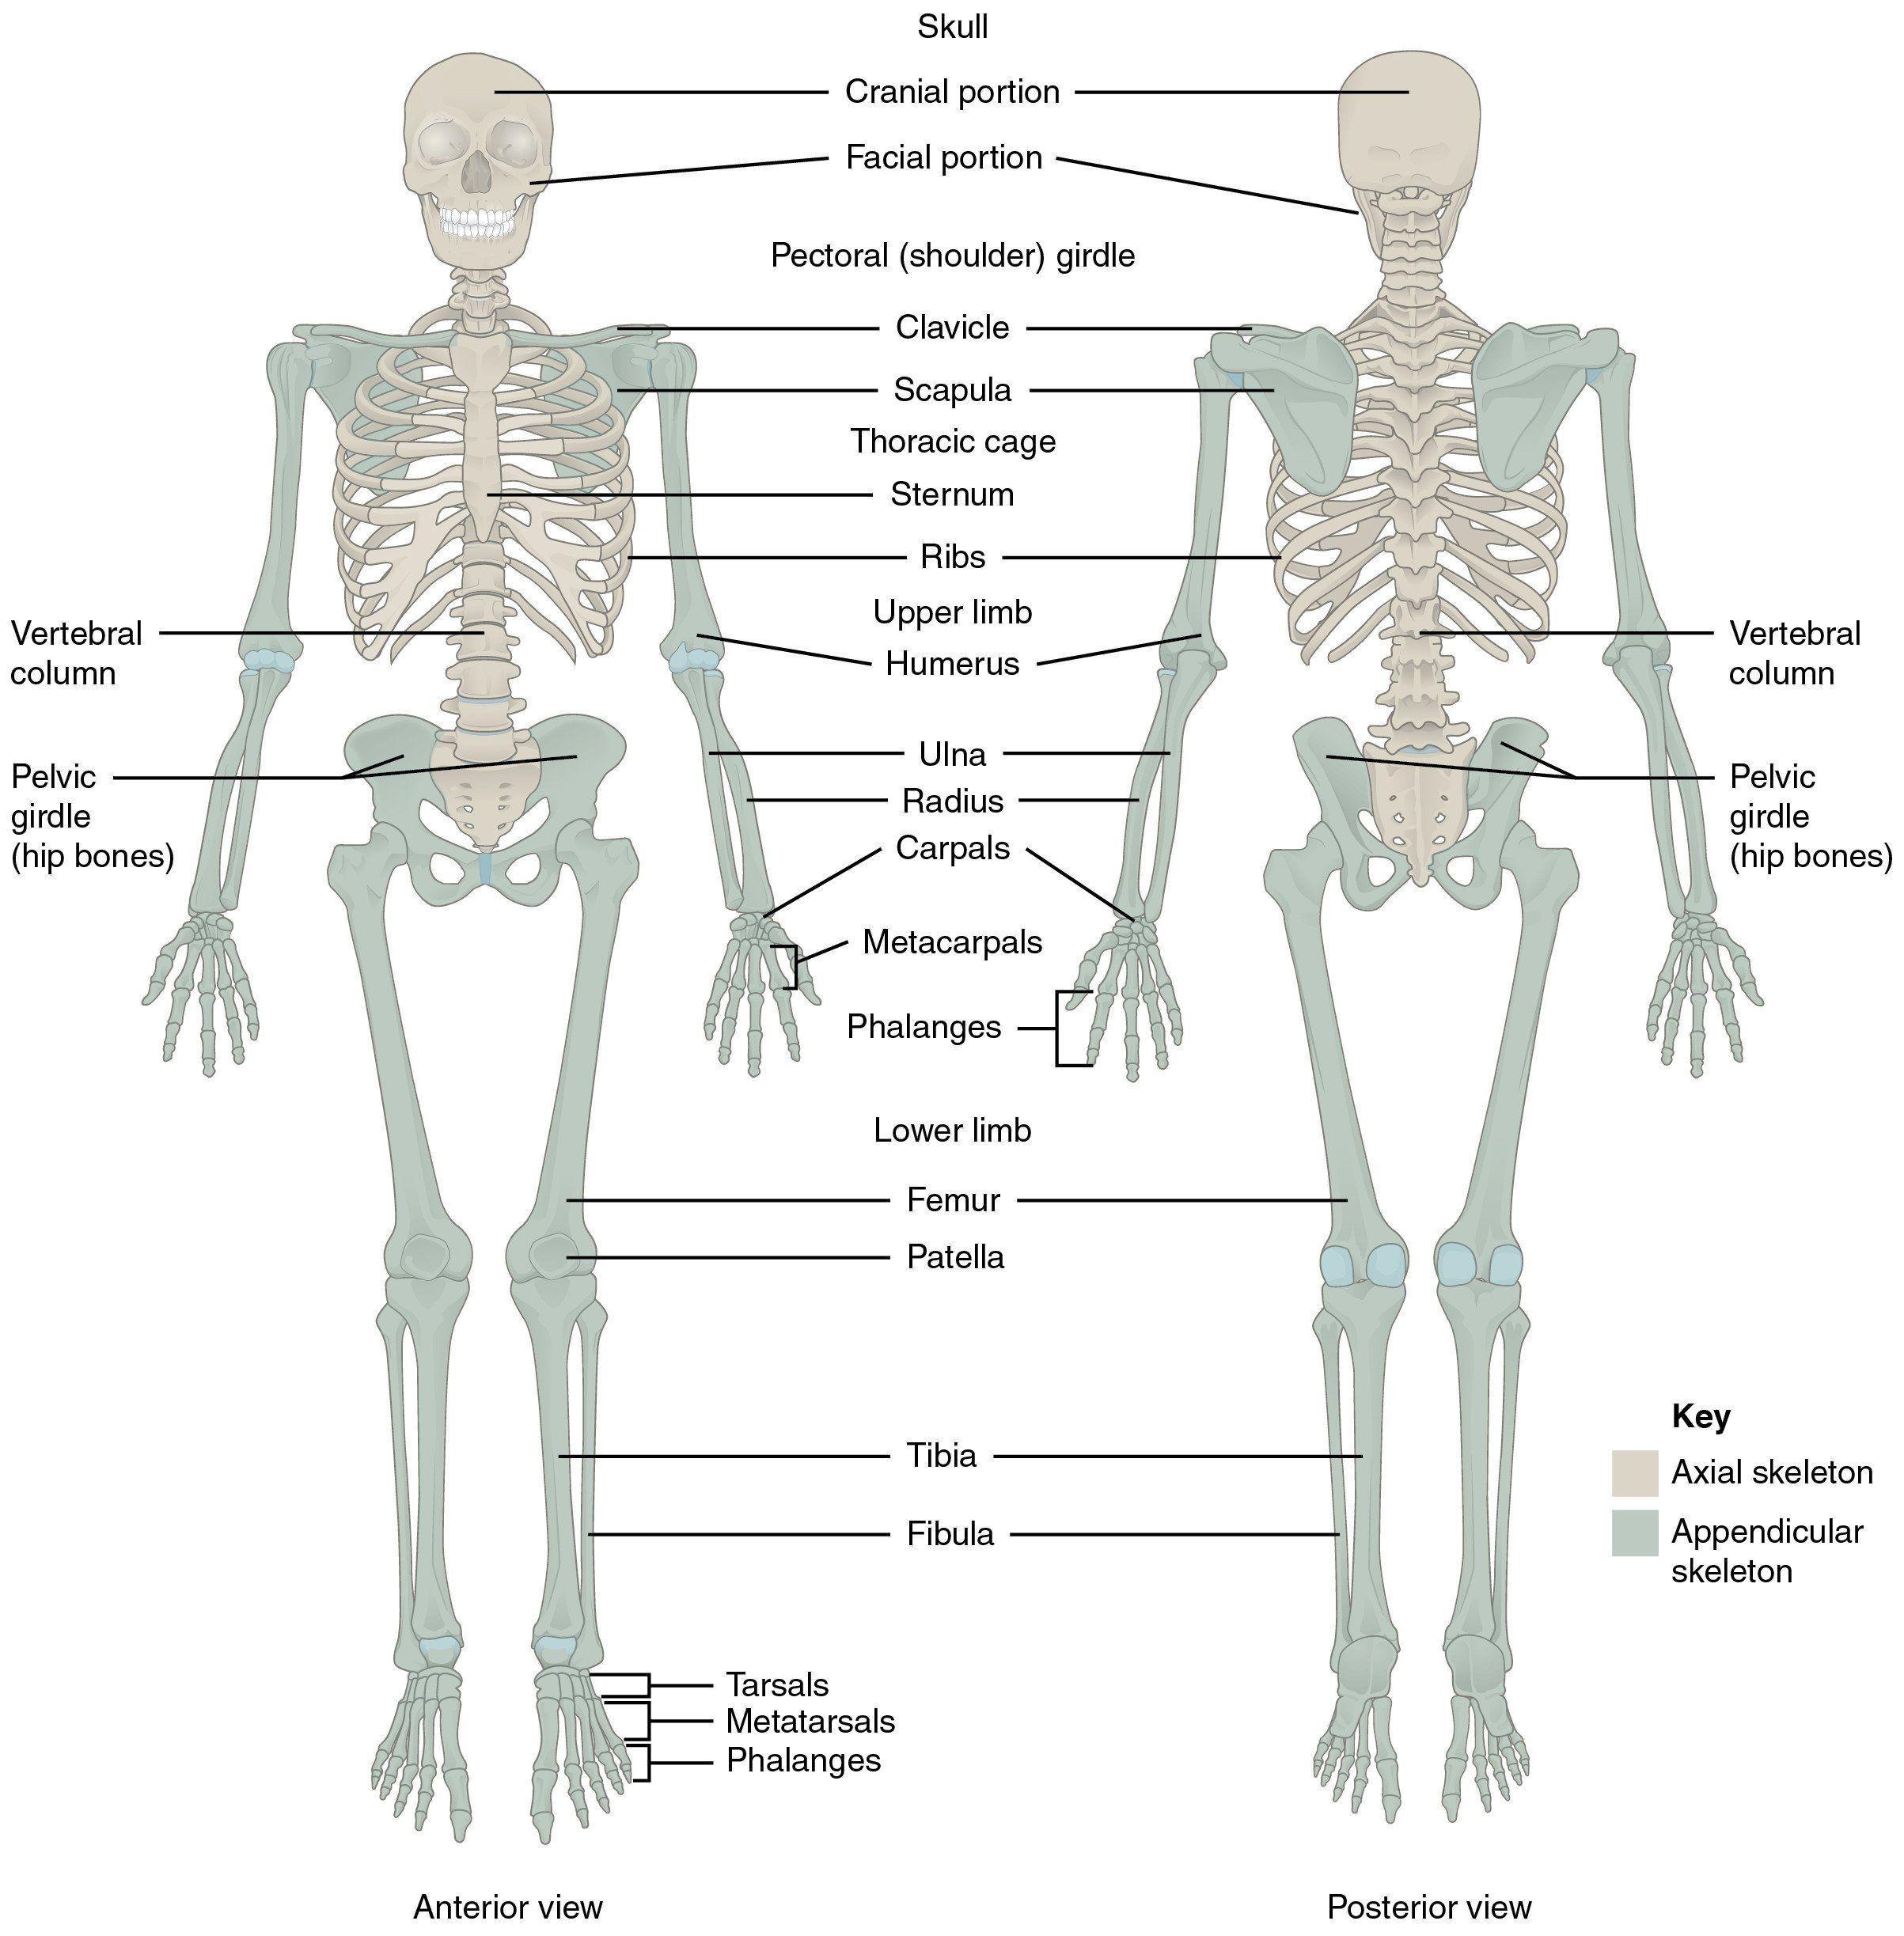 30 Math Coloring Worksheets 4th Grade Carolinaaac Net In 2020 Anatomy Bones Skeletal System Anatomy Human Bones Anatomy